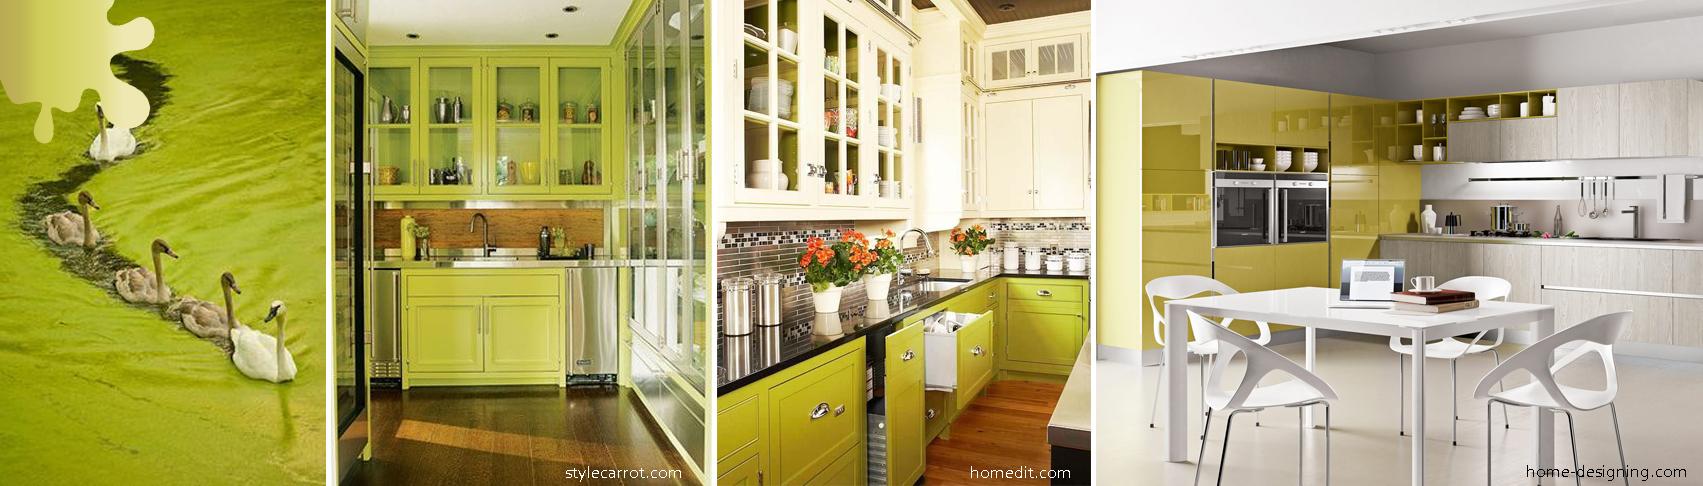 Amenajare-bucatarie_verde-chartreuse_culori-curiozitati